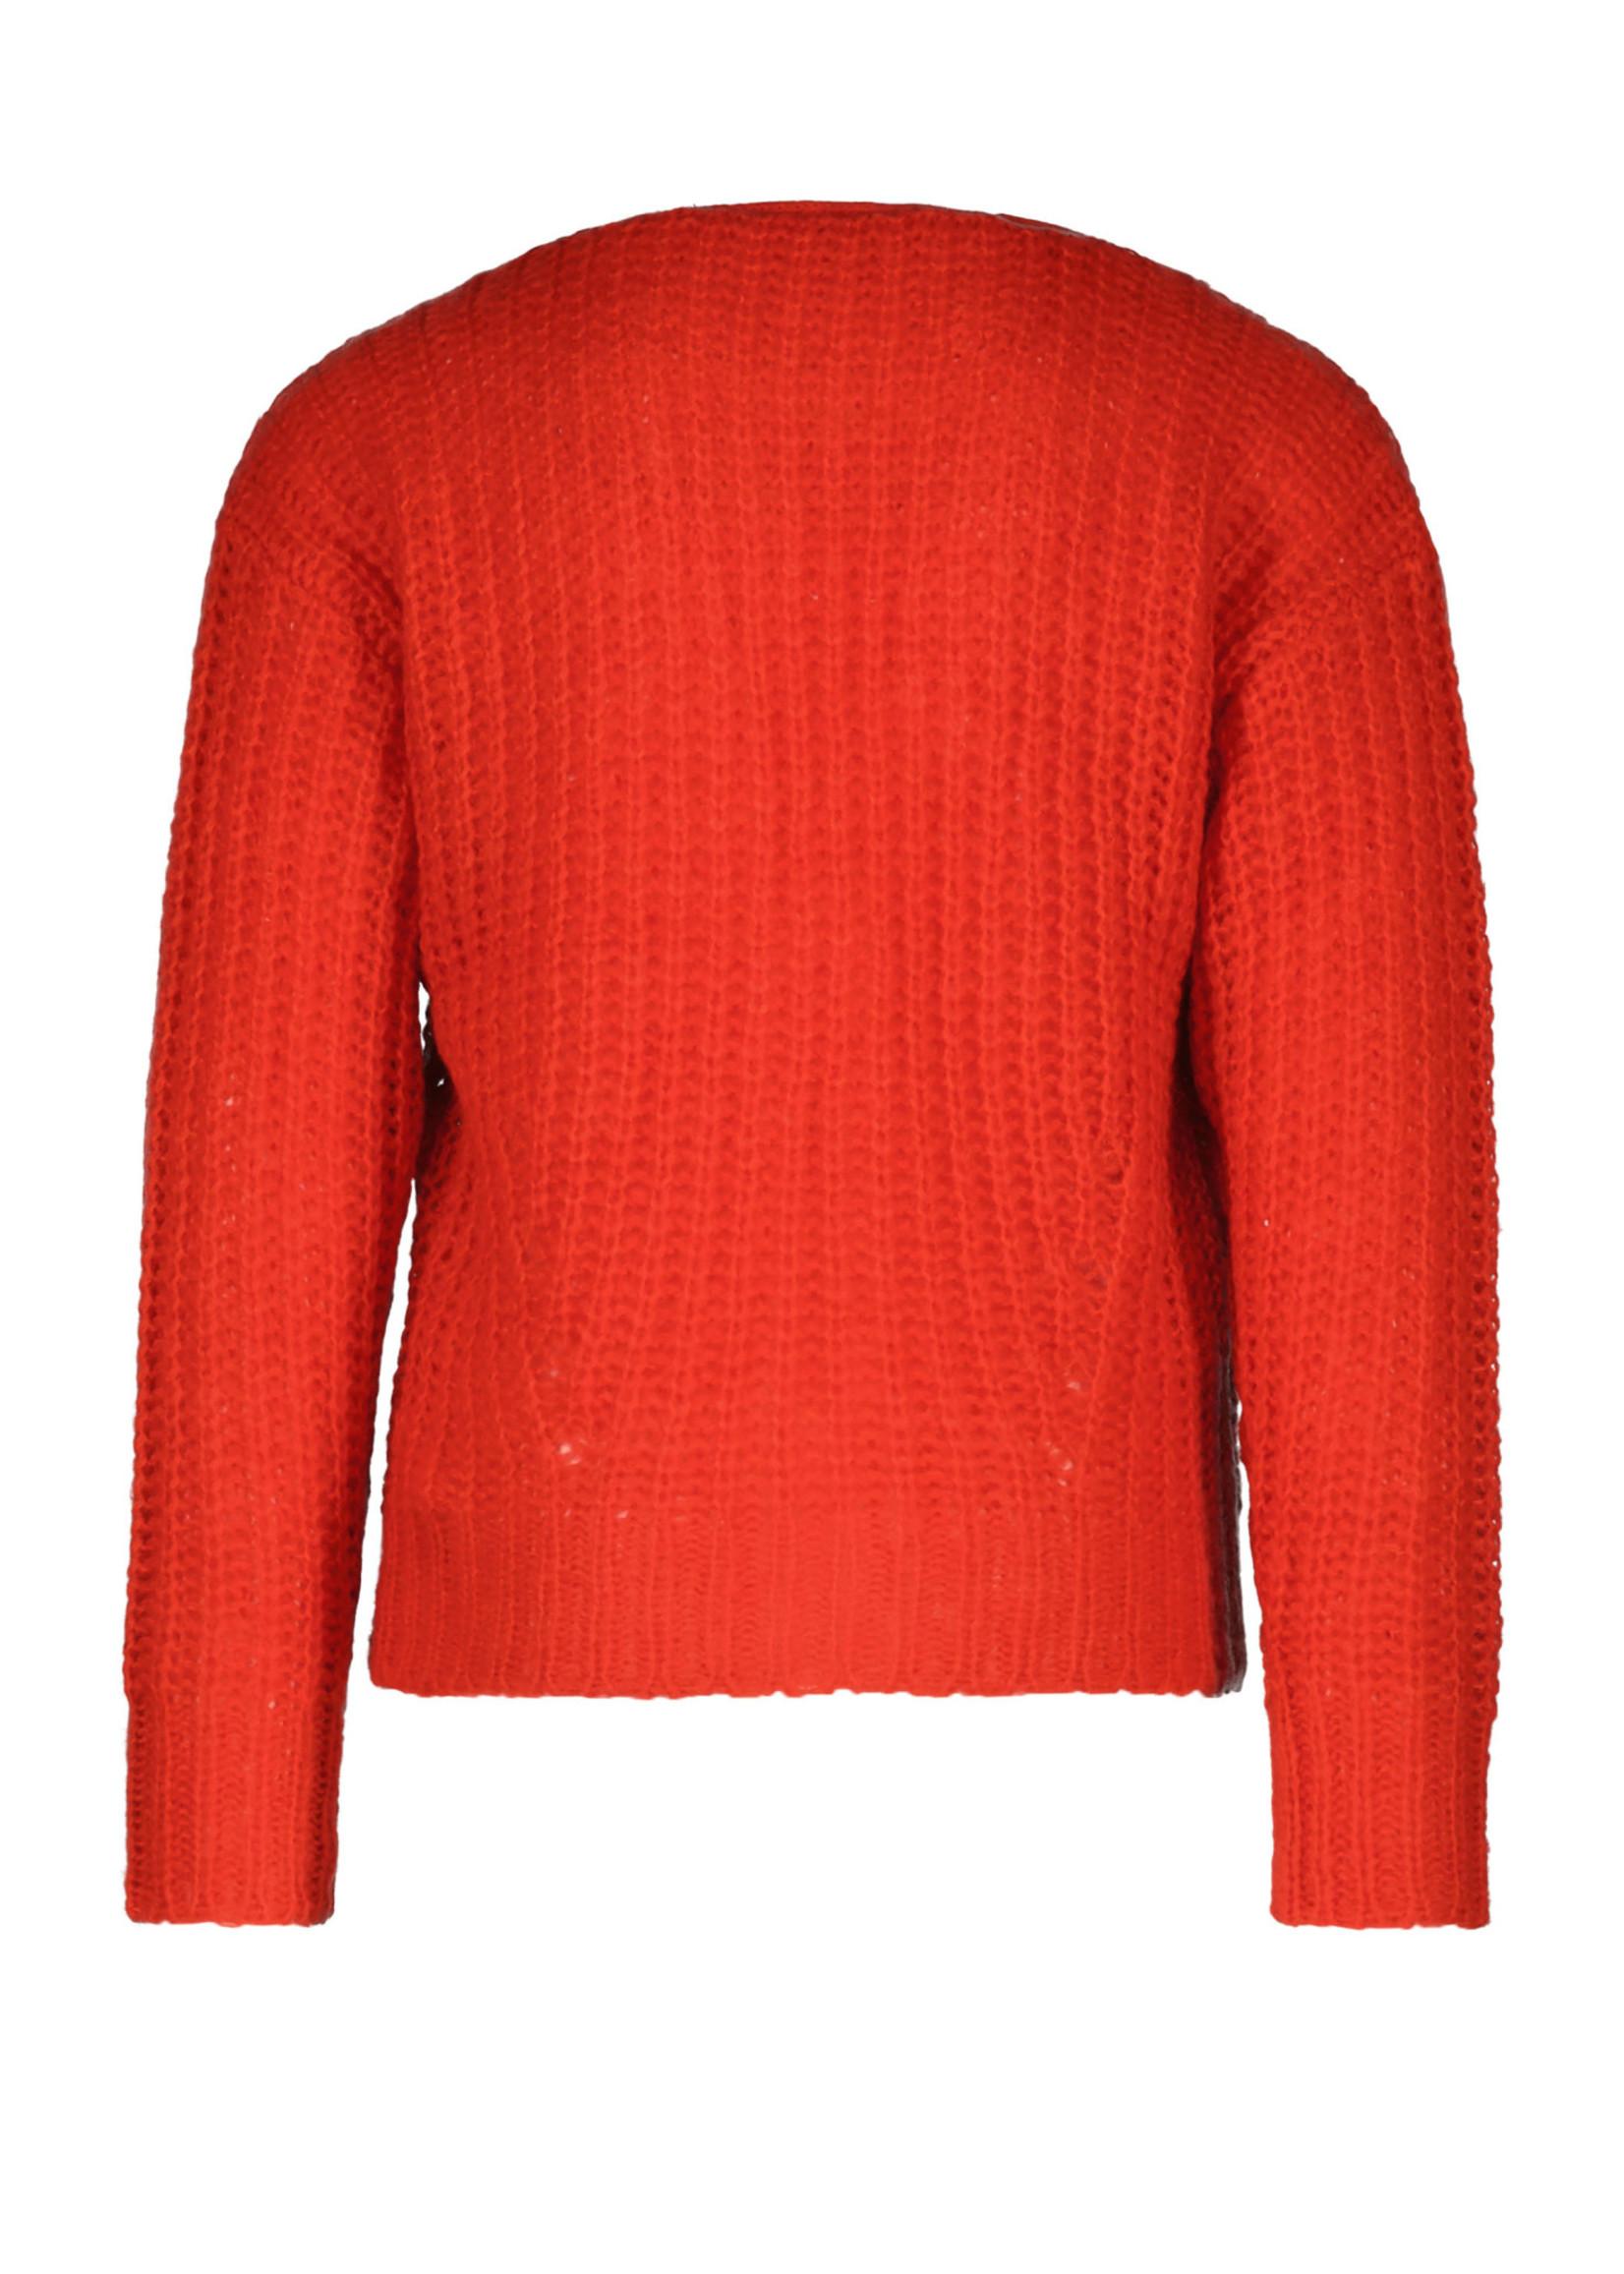 LIKE FLO LIKE FLO Cardigan knit chili